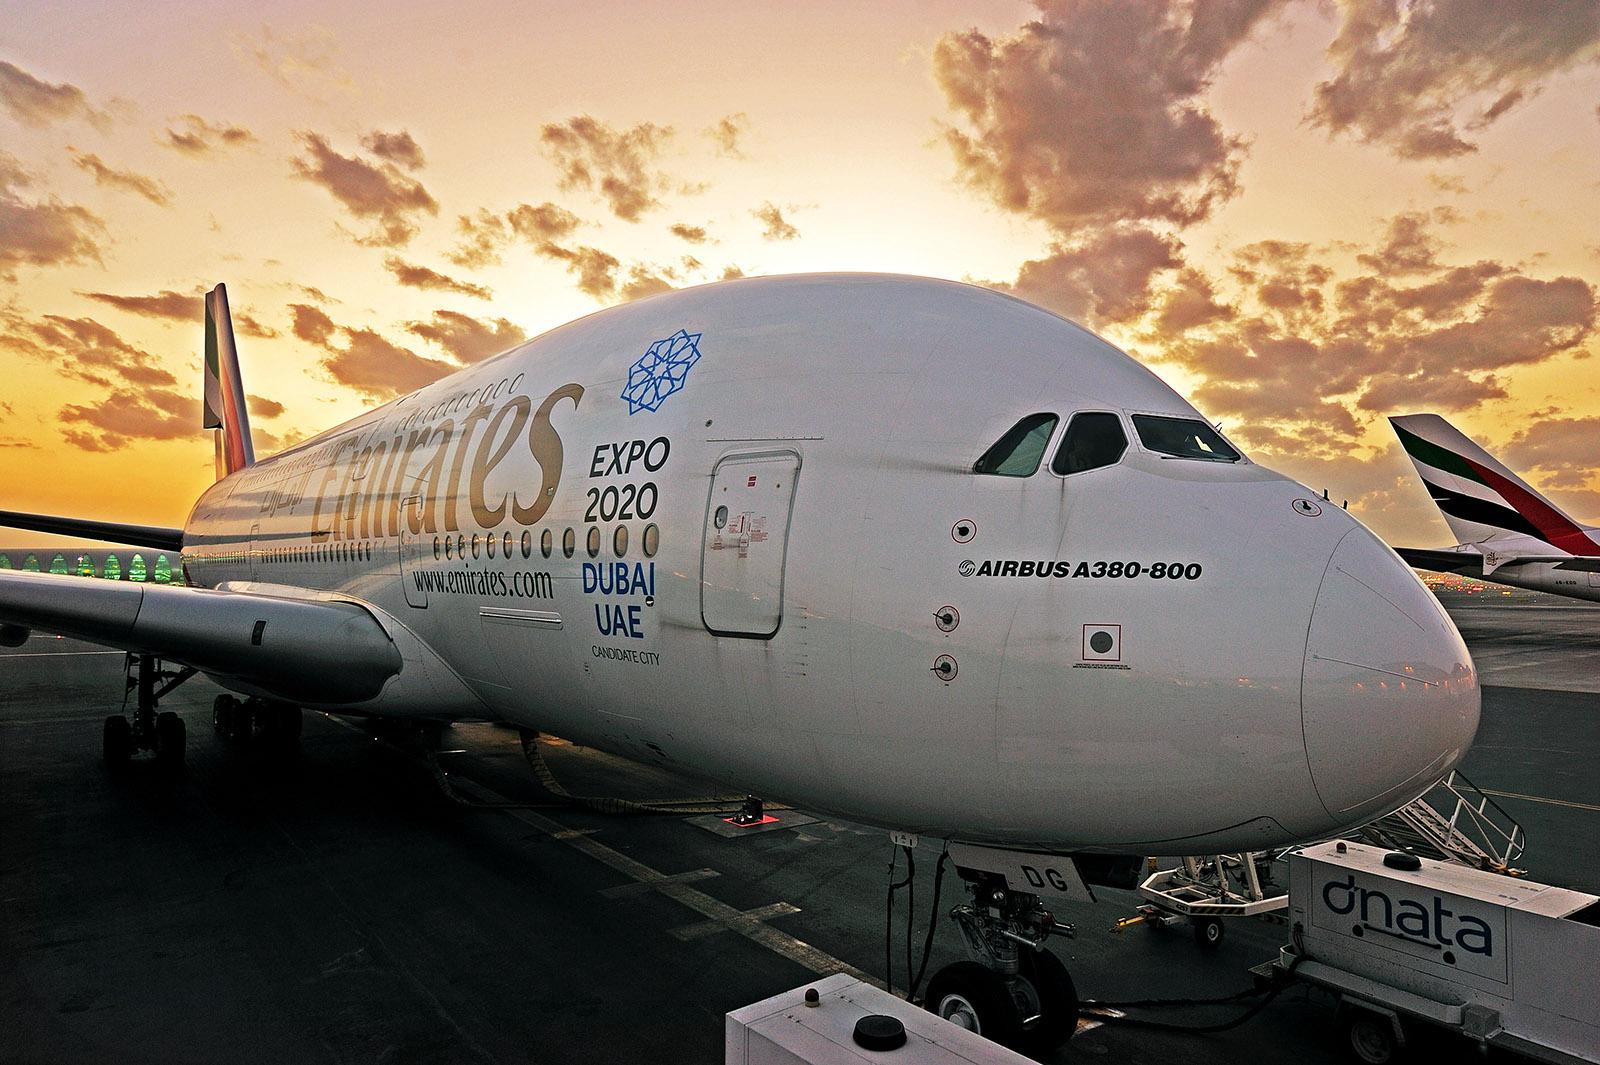 Emirates Will Fly Dubai to Los Angeles